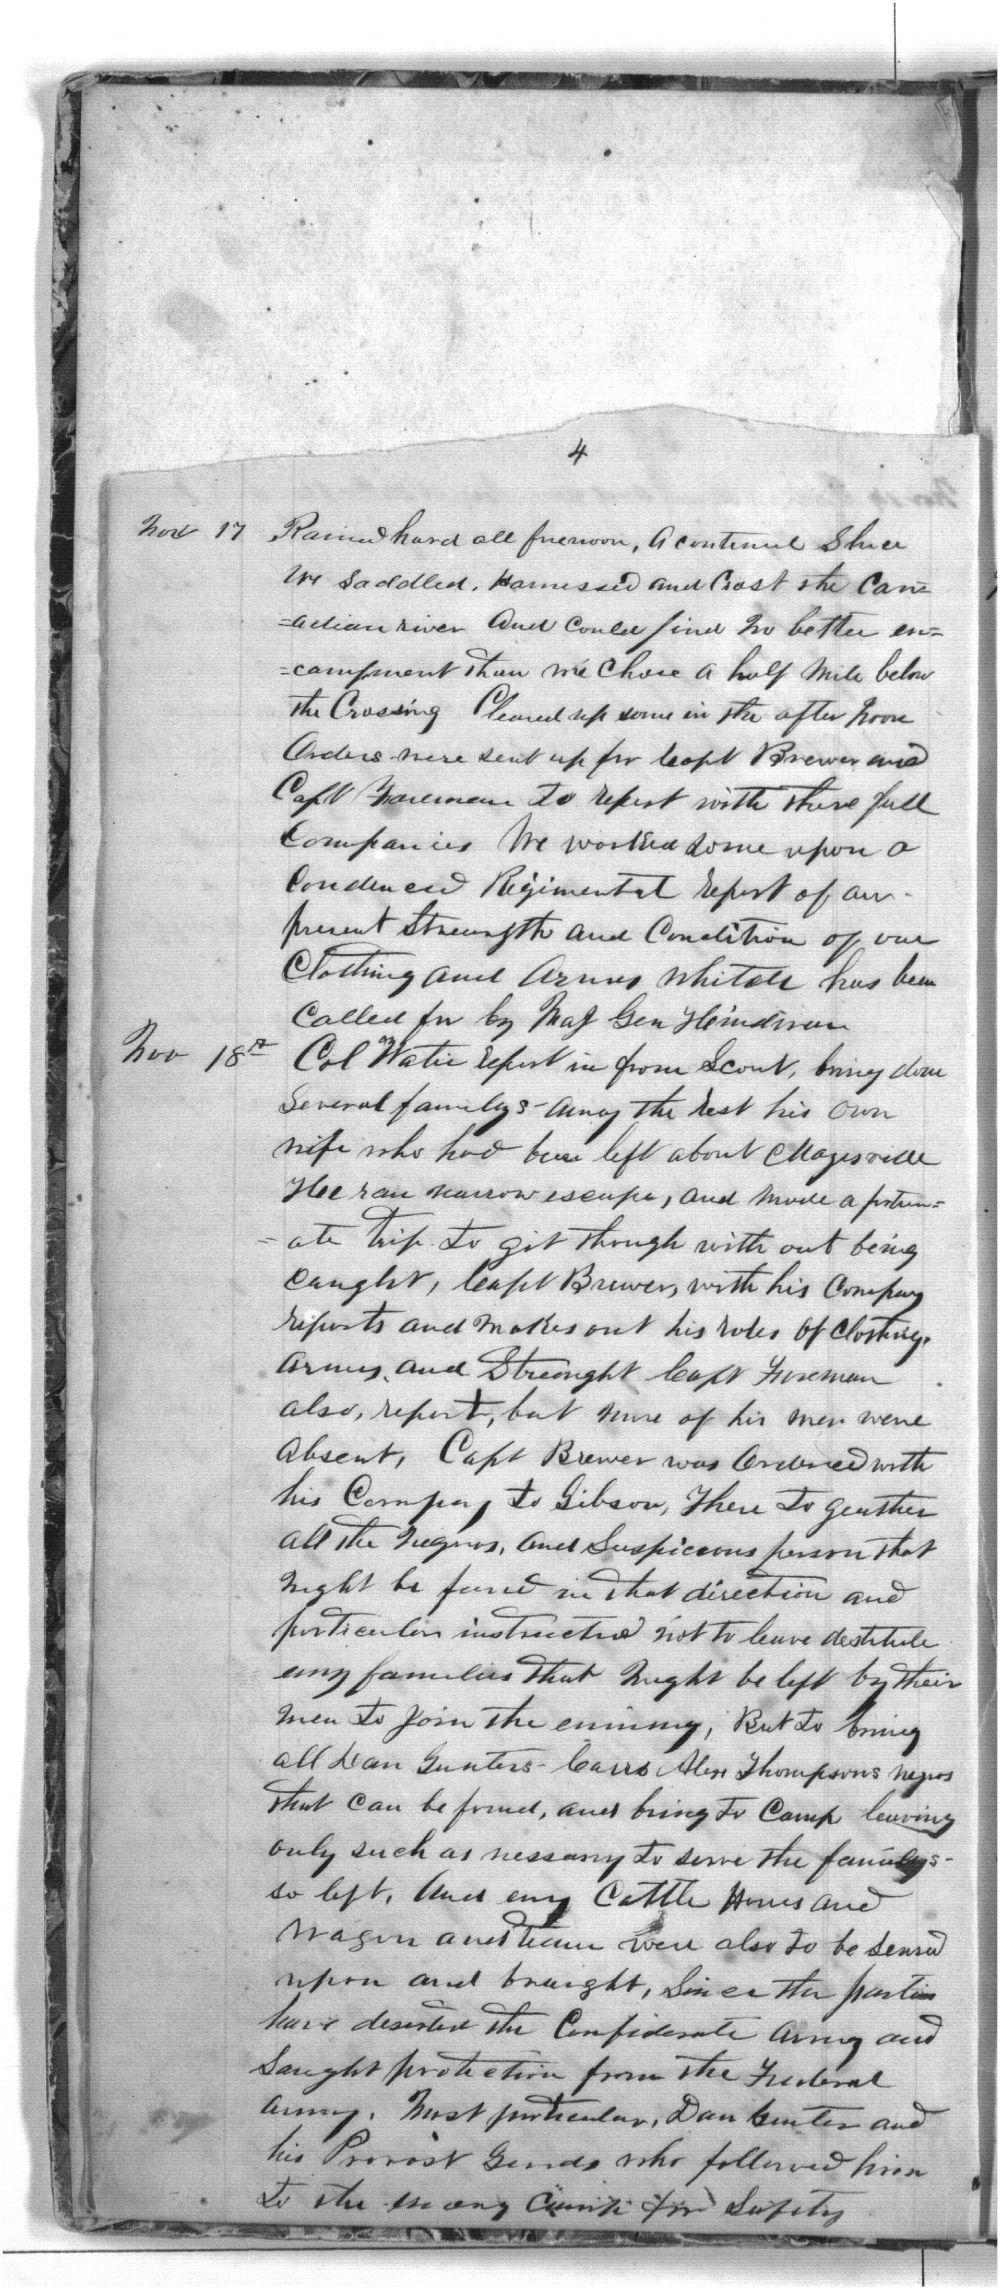 First Cherokee Regiment day book - 4